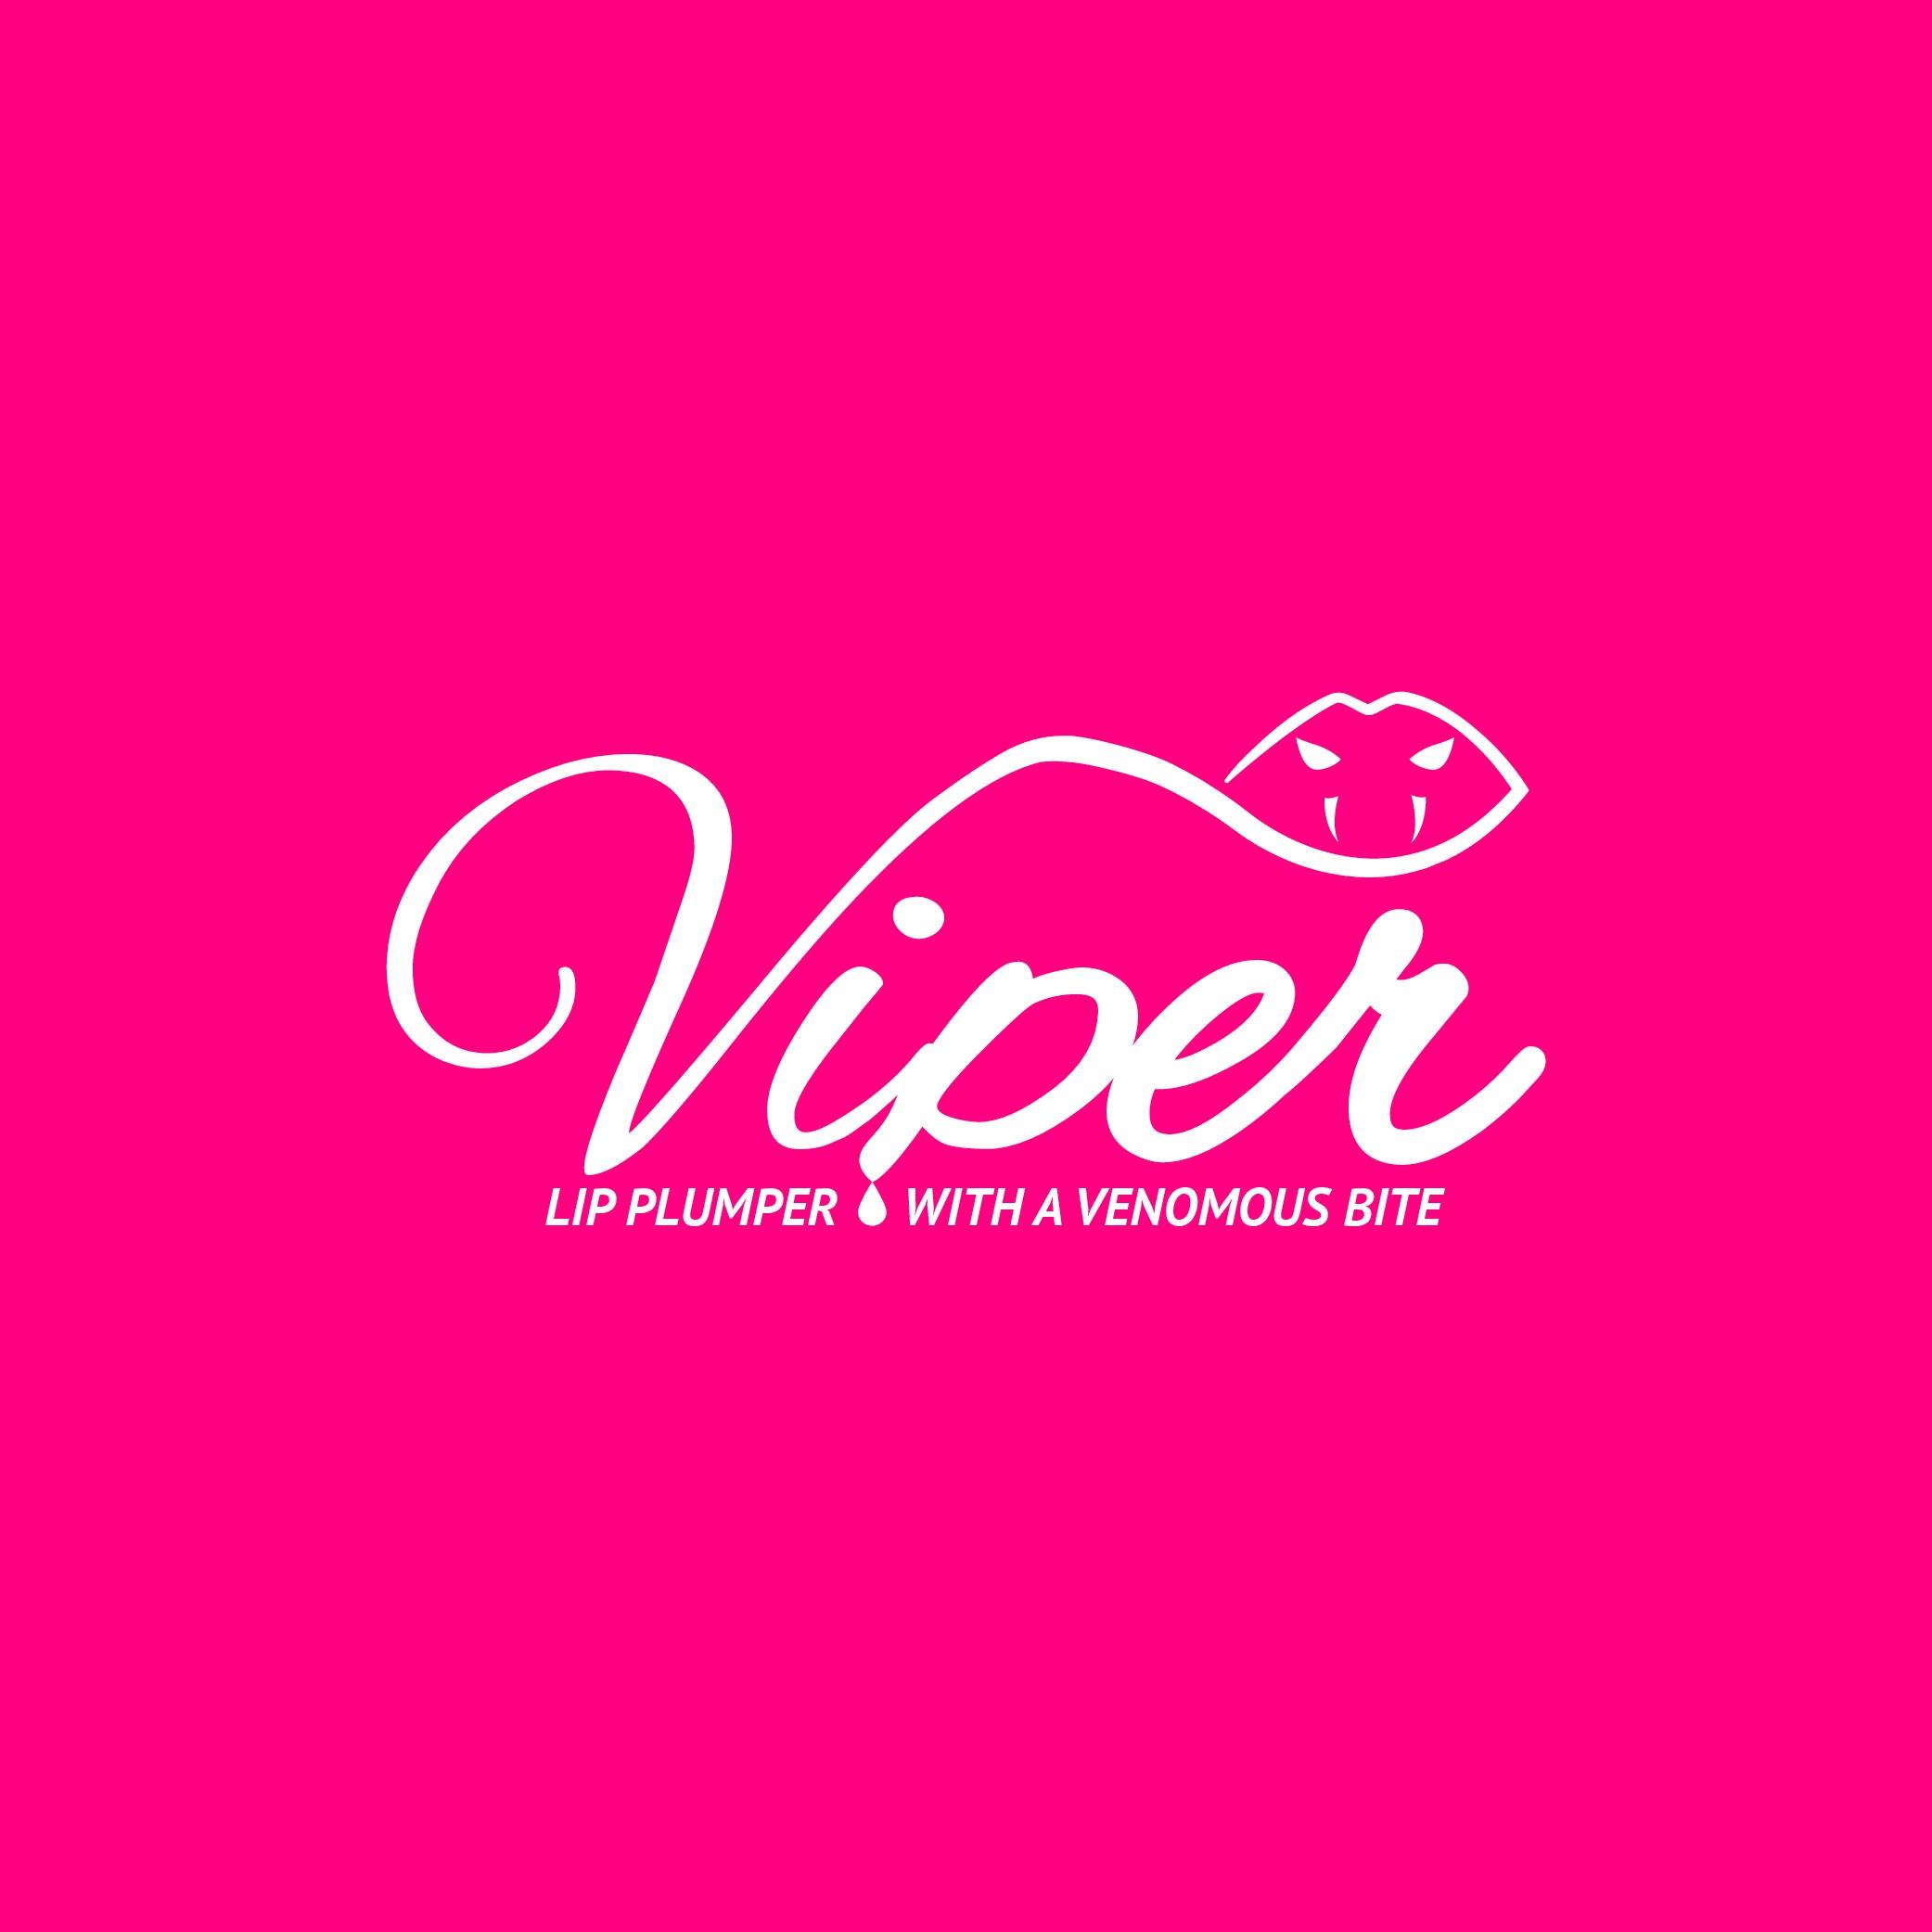 Viper LIp Gloss With Bite